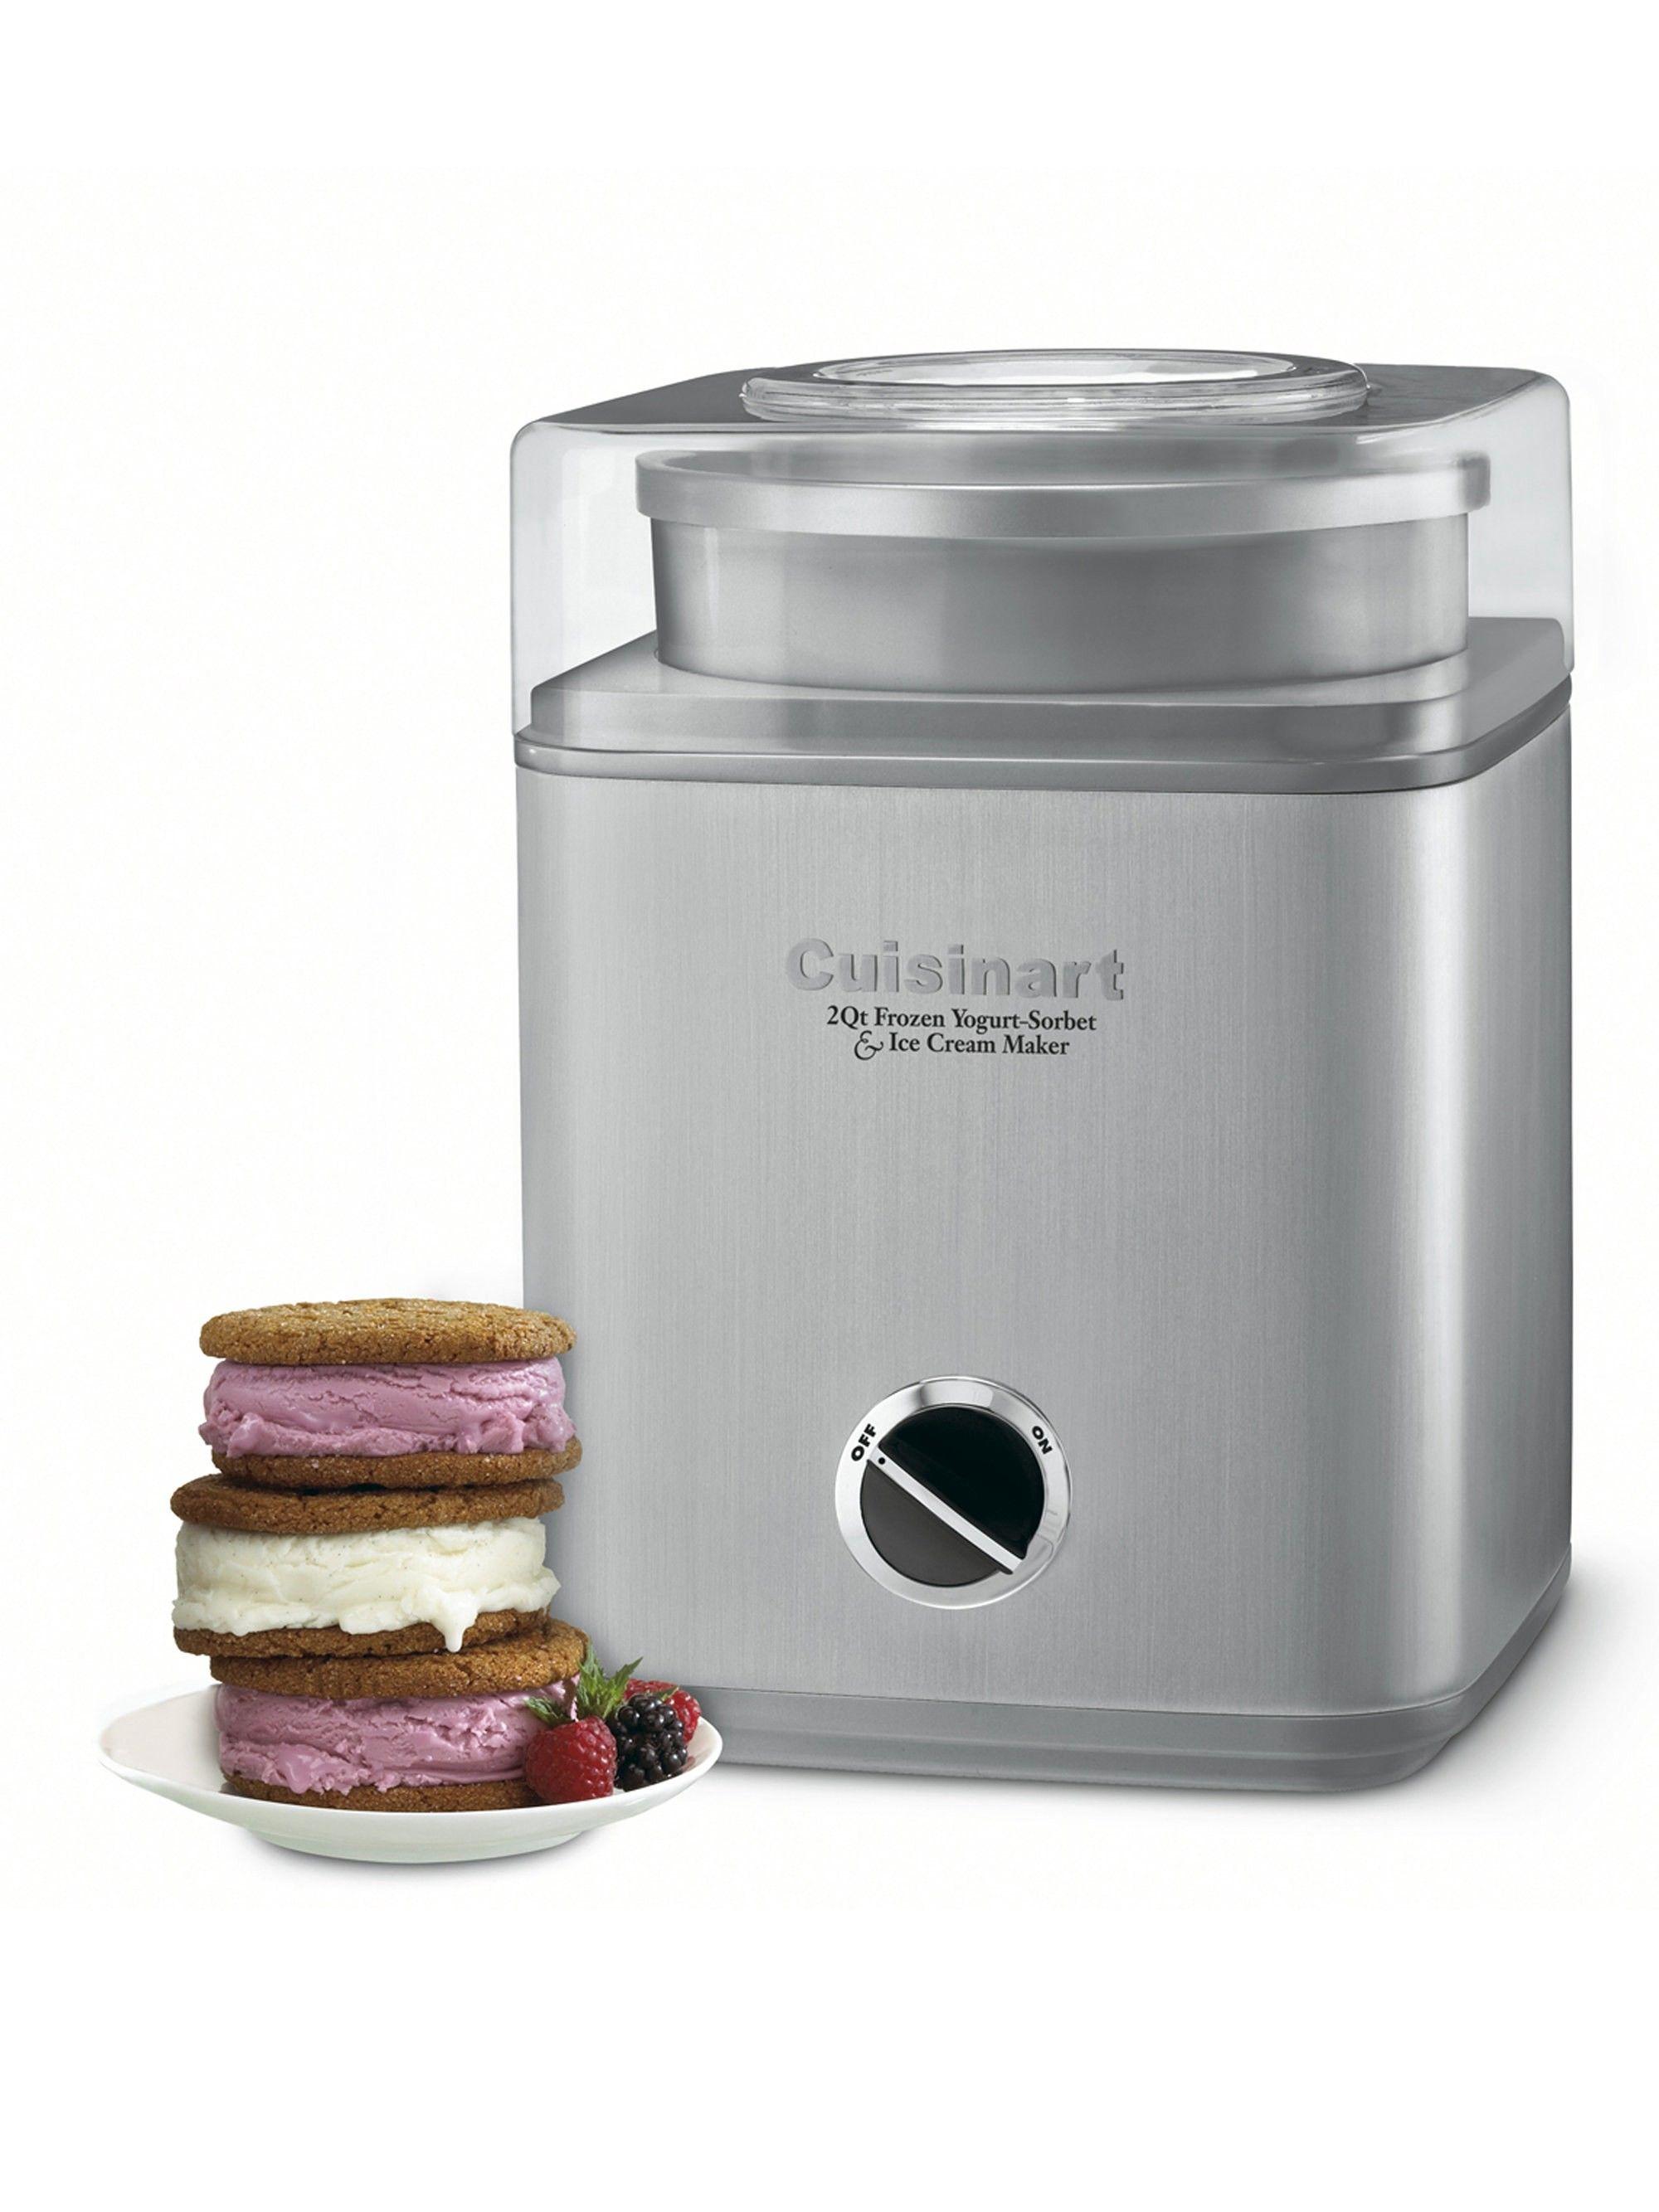 Cuisinart Pure Indulgence 2 Quart Ice Cream Maker Best Ice Cream Maker Sorbet Ice Cream Ice Cream Maker Reviews